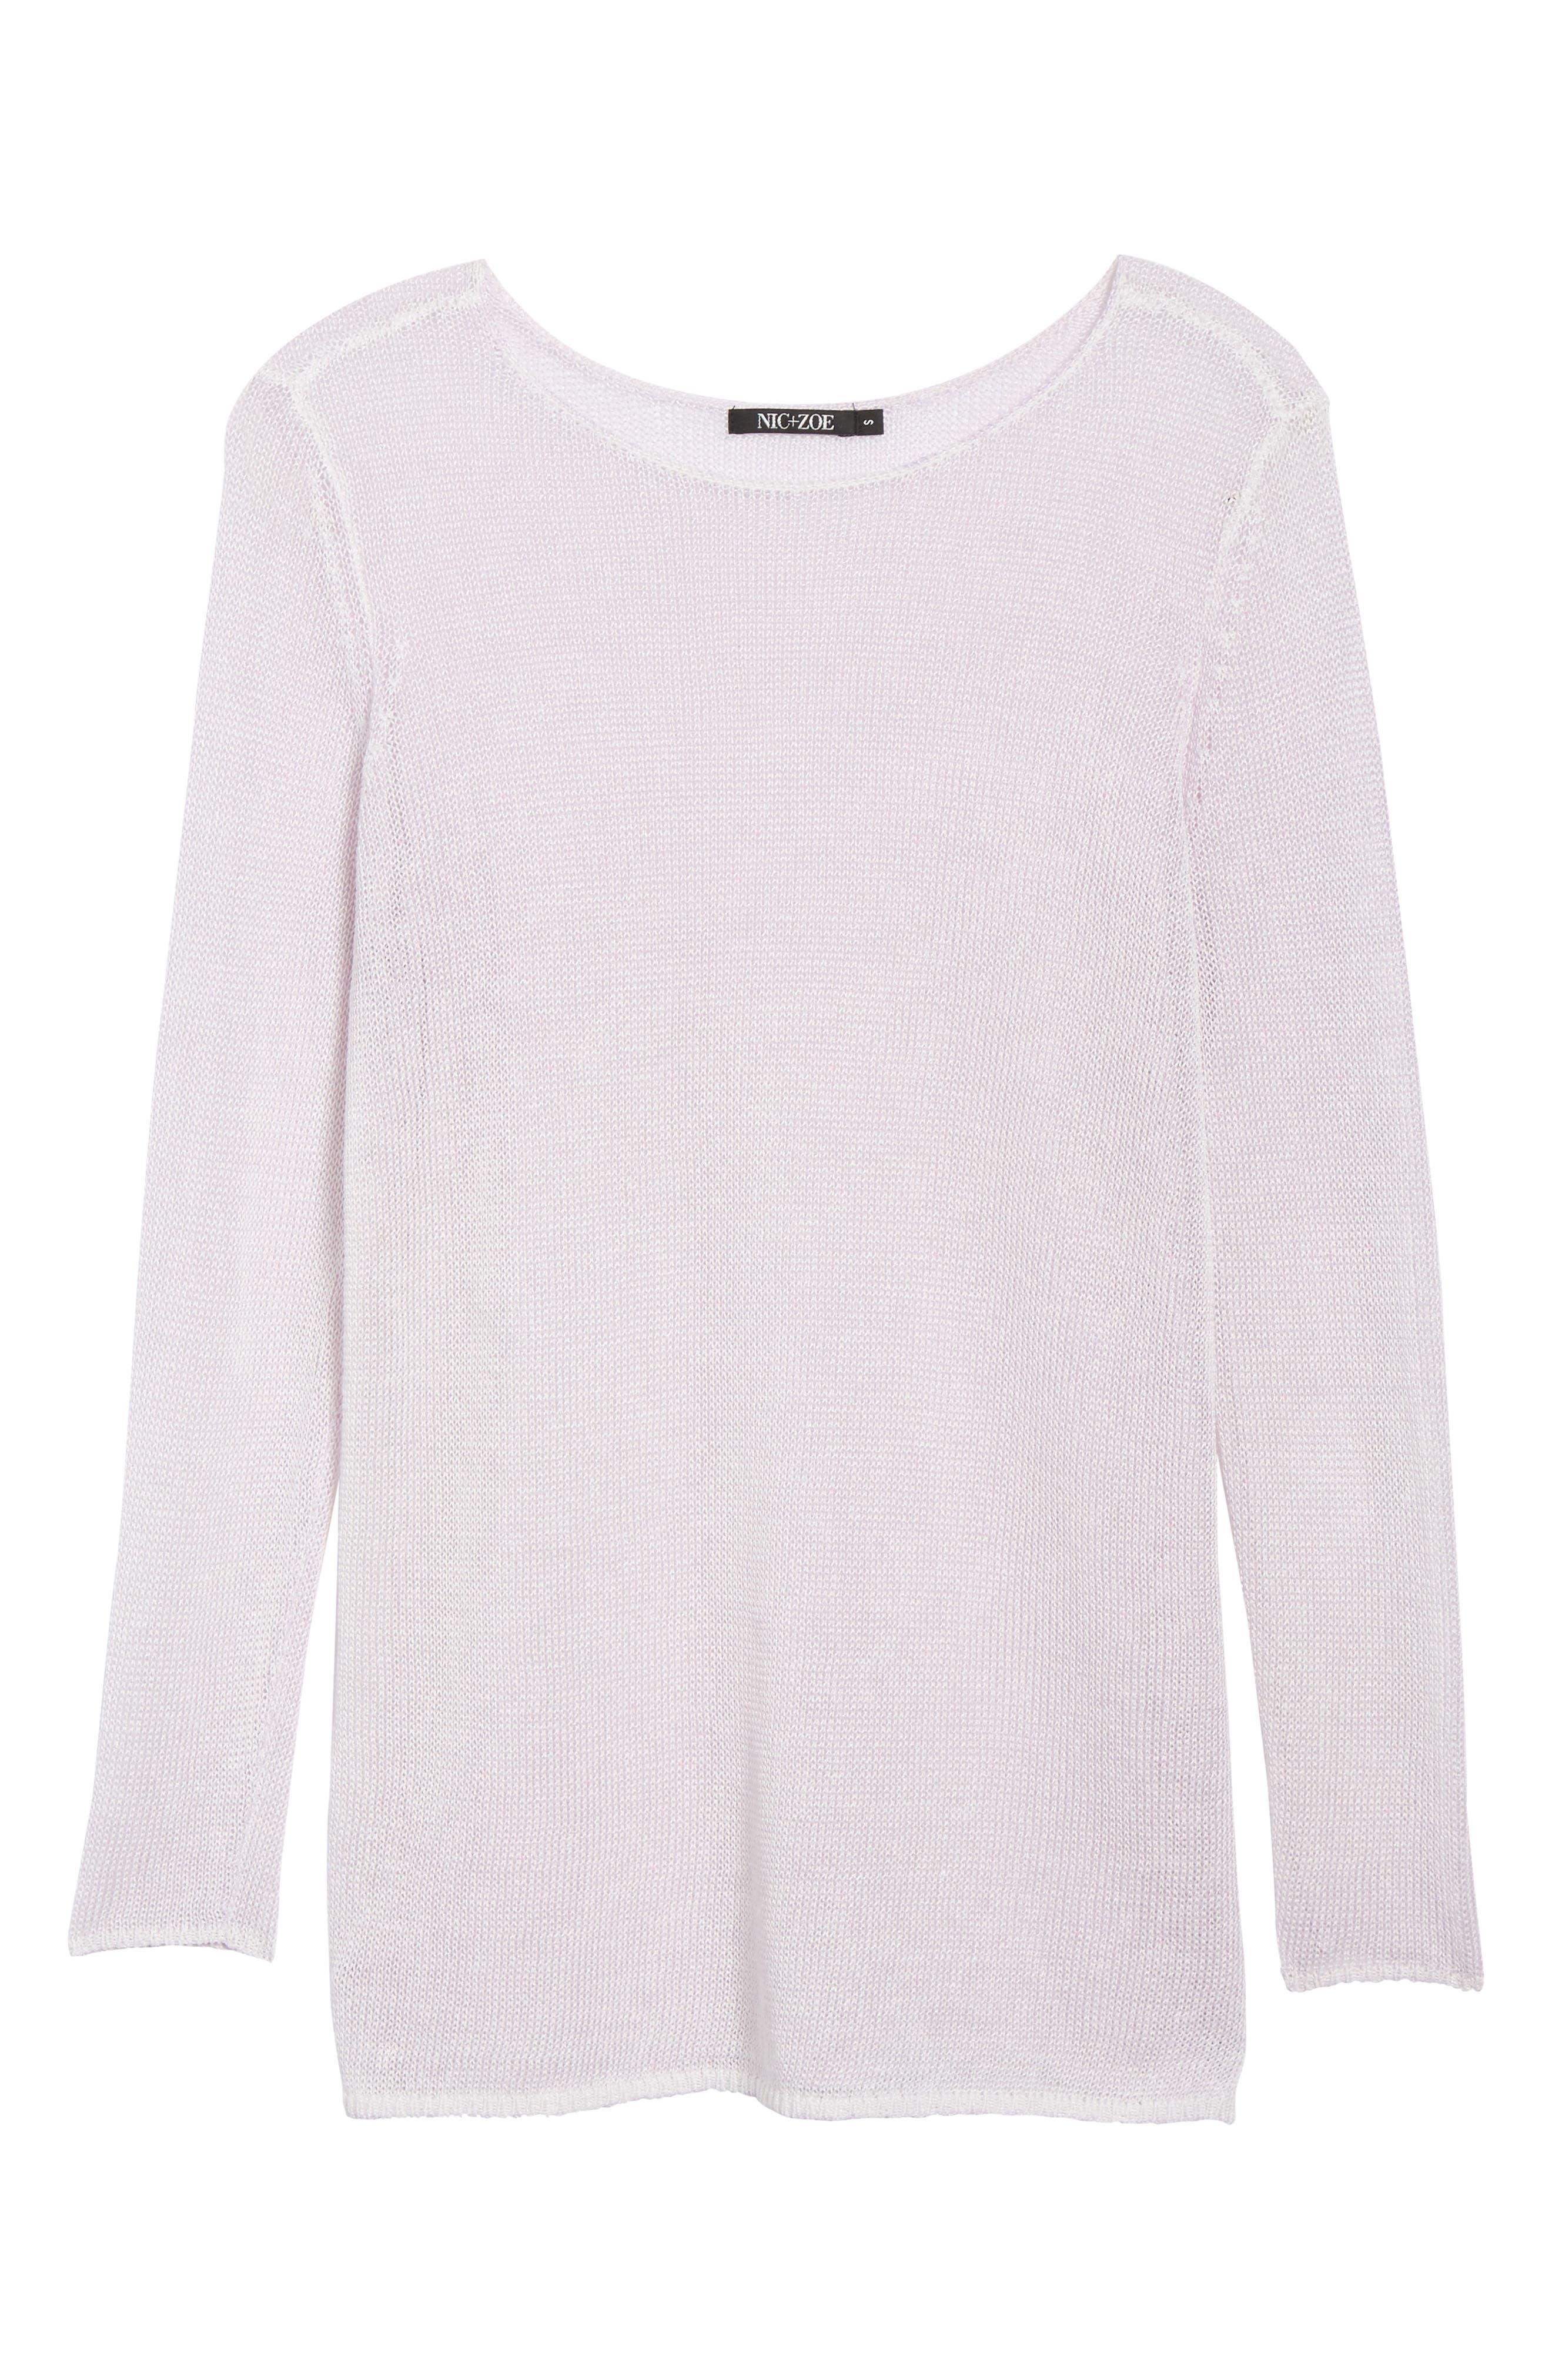 NIC + ZOE Poolside Linen Blend Sweater,                             Alternate thumbnail 24, color,